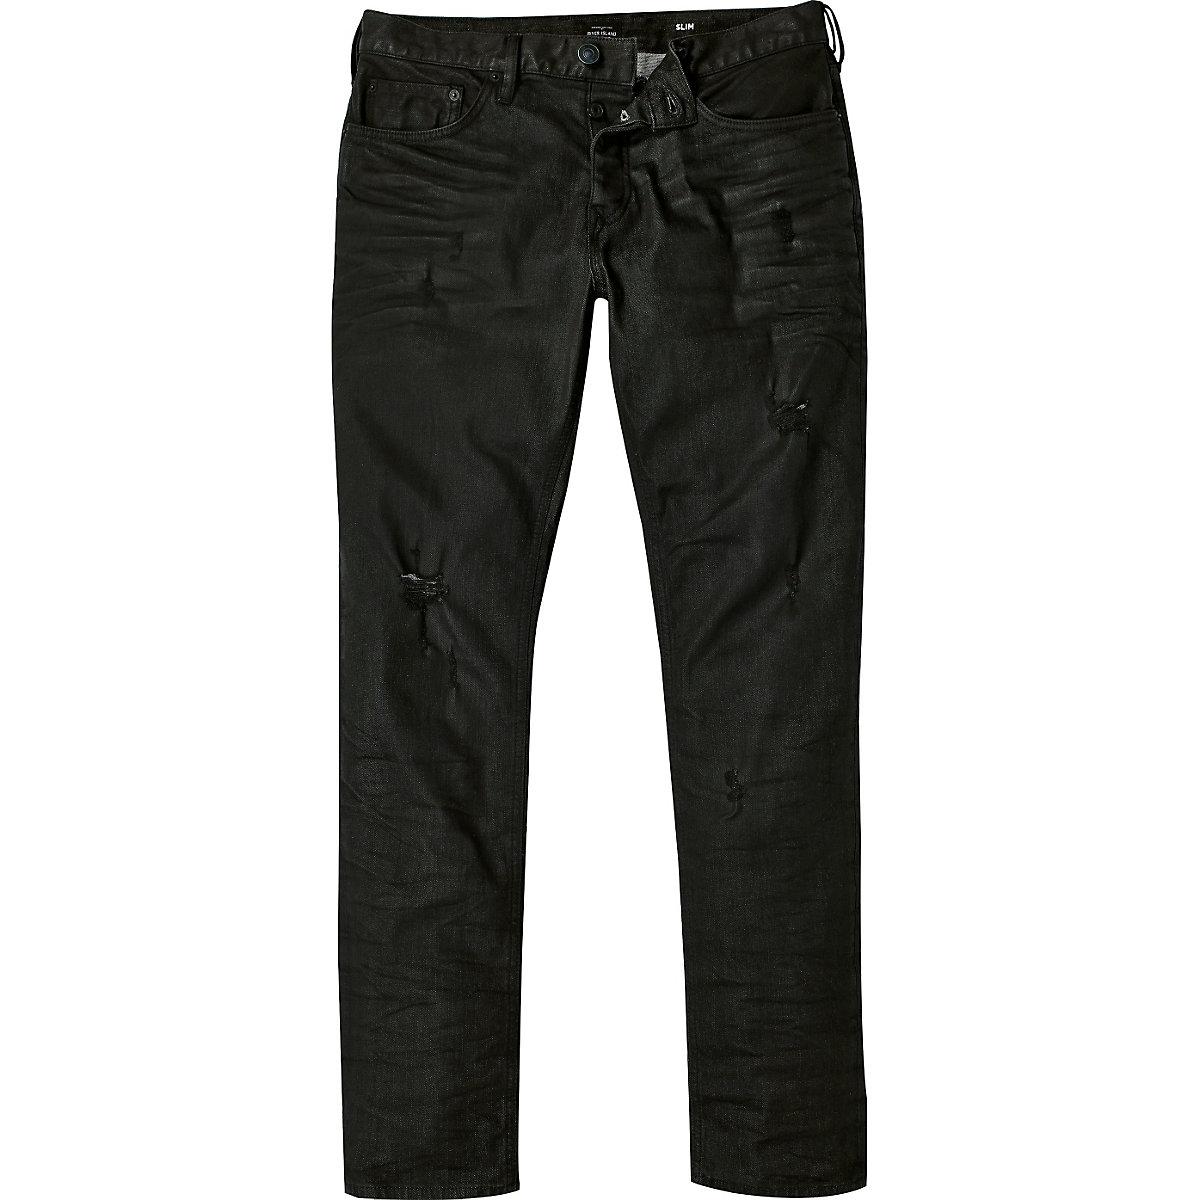 Black distressed Dylan slim jeans